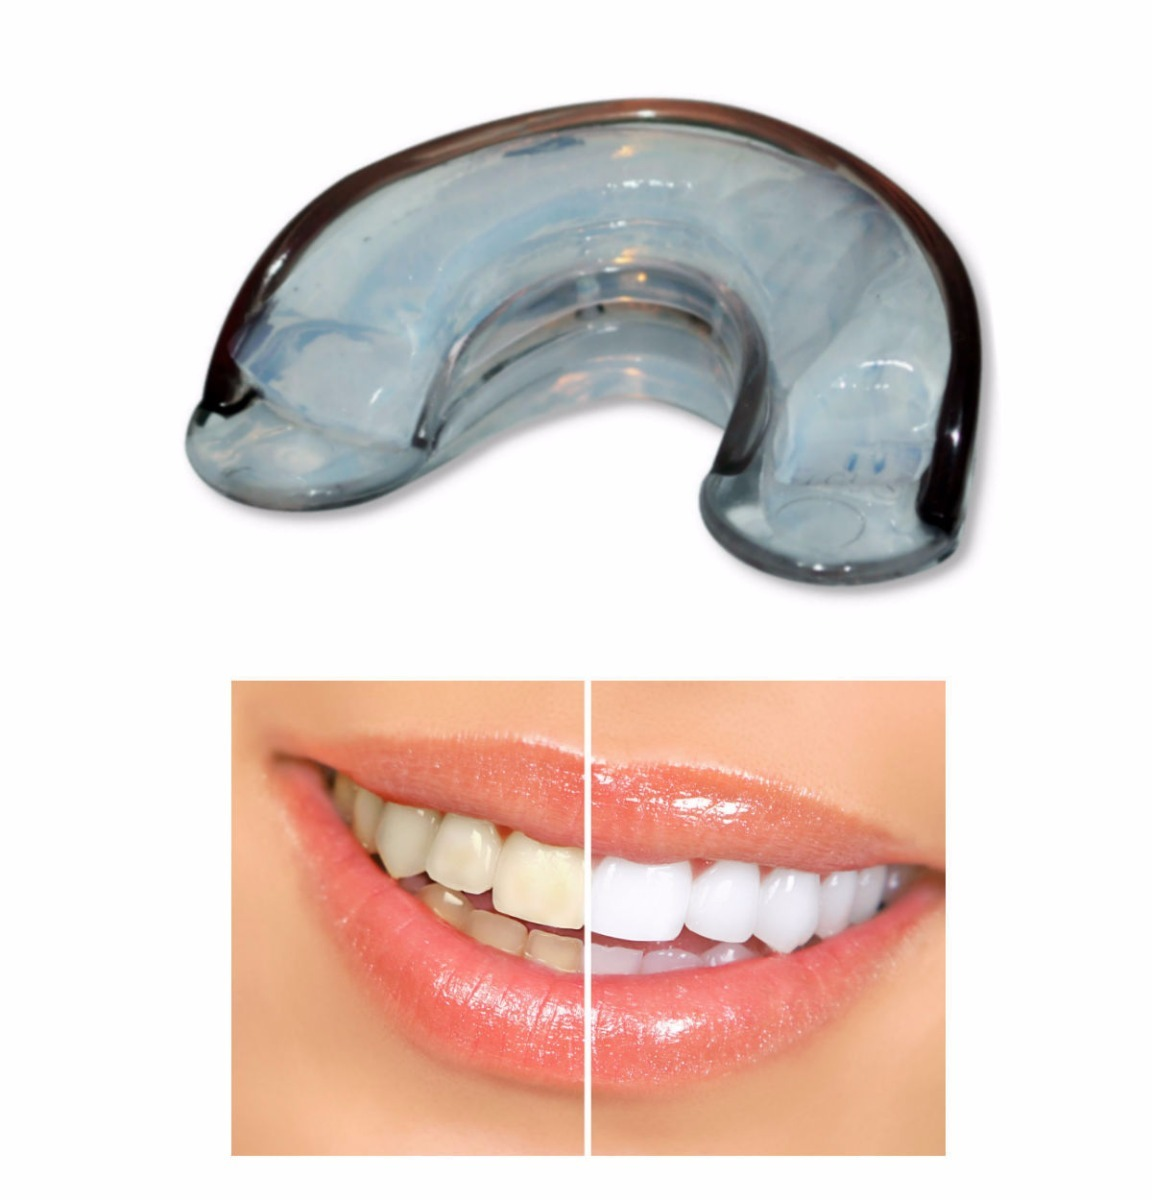 Clareamento Dental Whiteness Simple 22 6 Gel Molde Silicone R